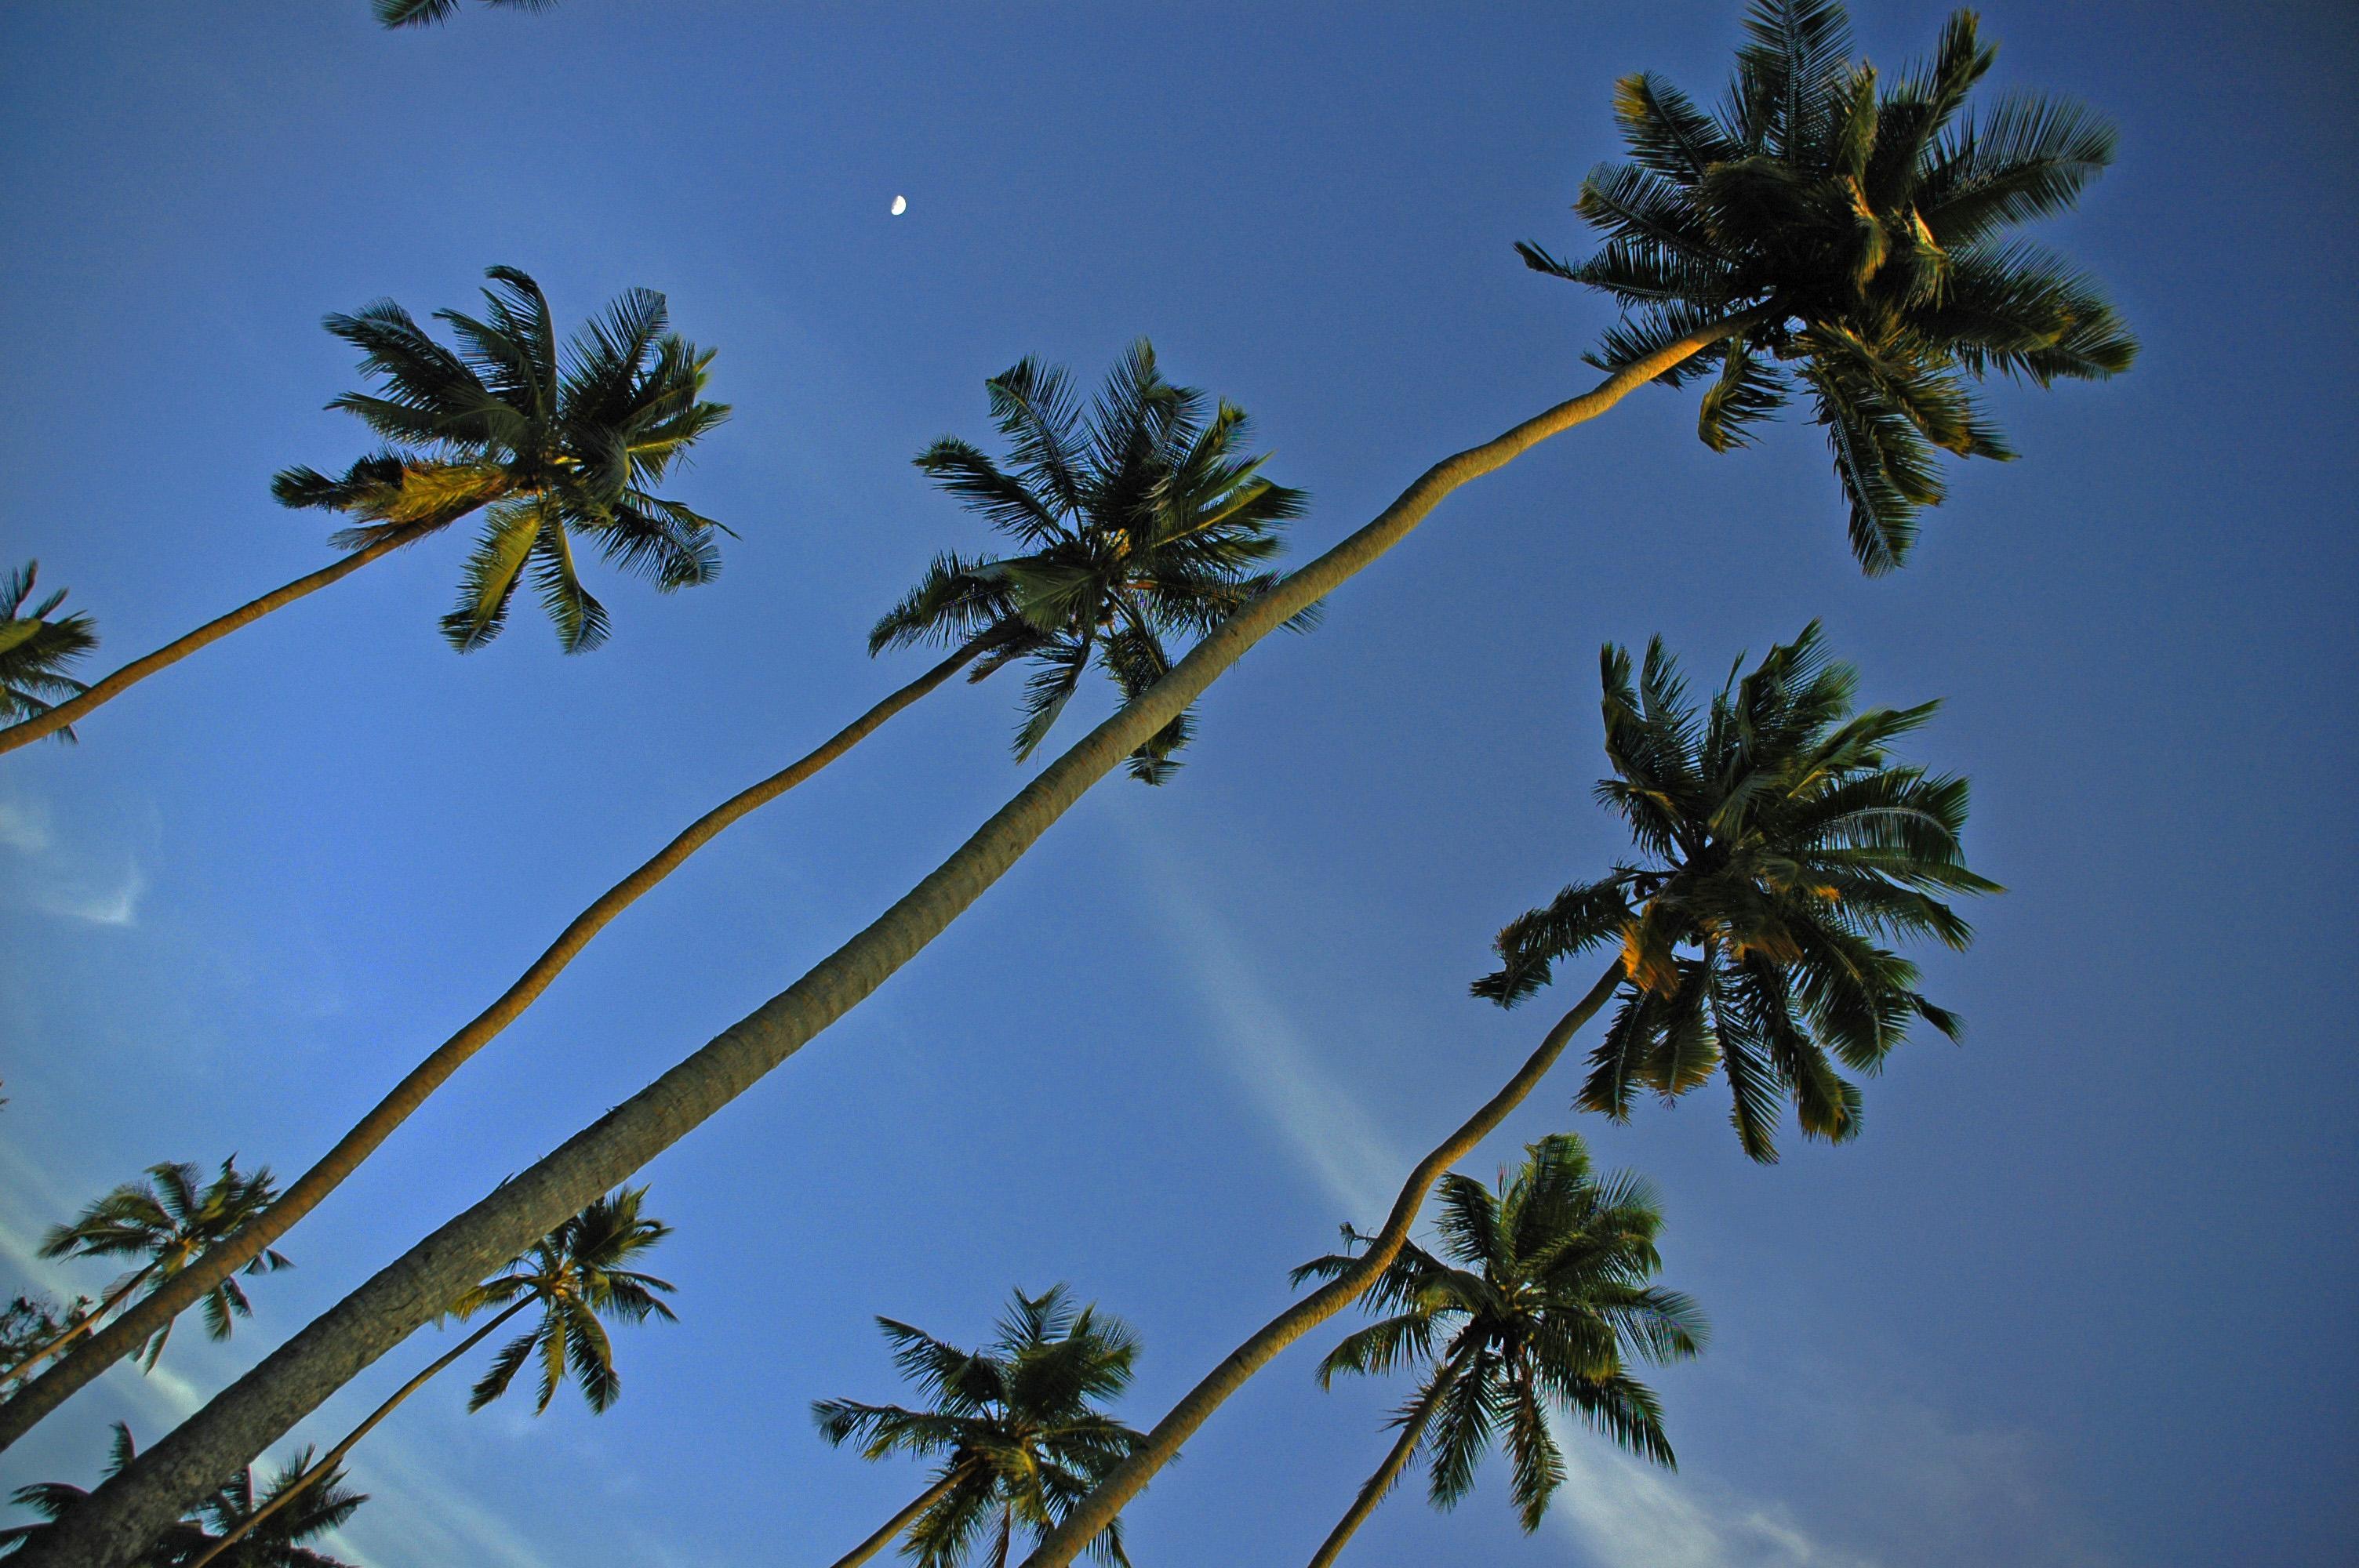 Island Palms Secychelles © JonoVernon-Powell